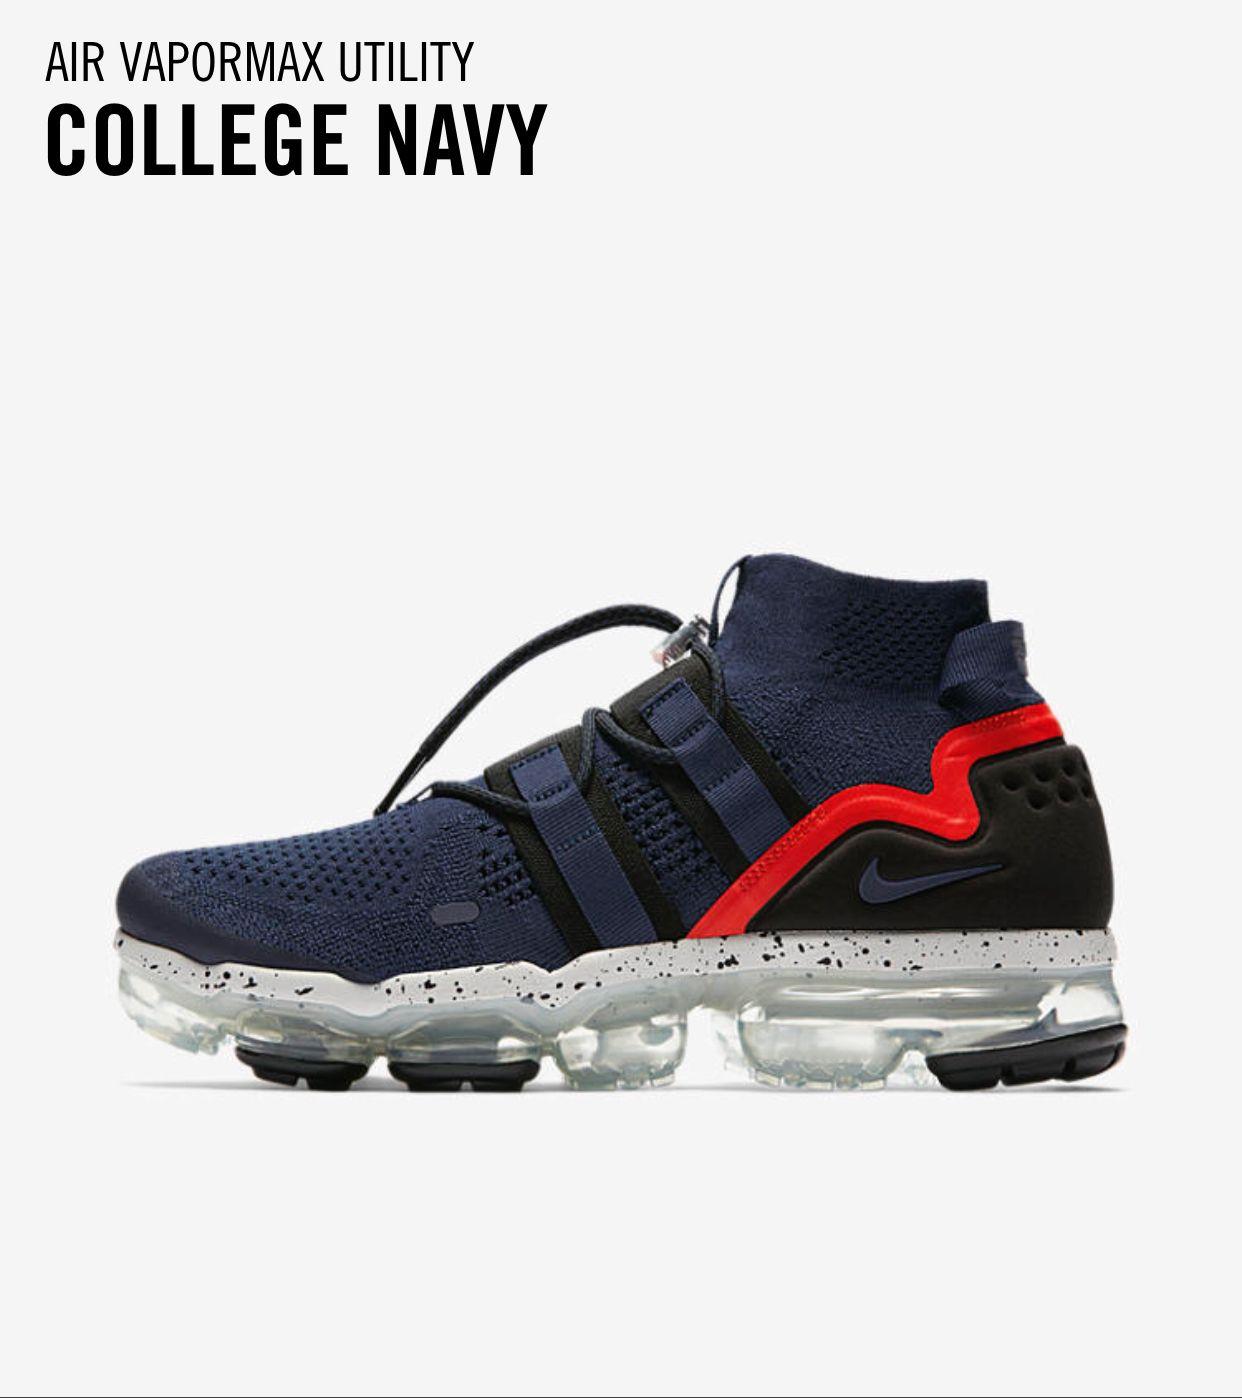 Via Nike SNEAKRS: www.nike.com/gb/launch/t/